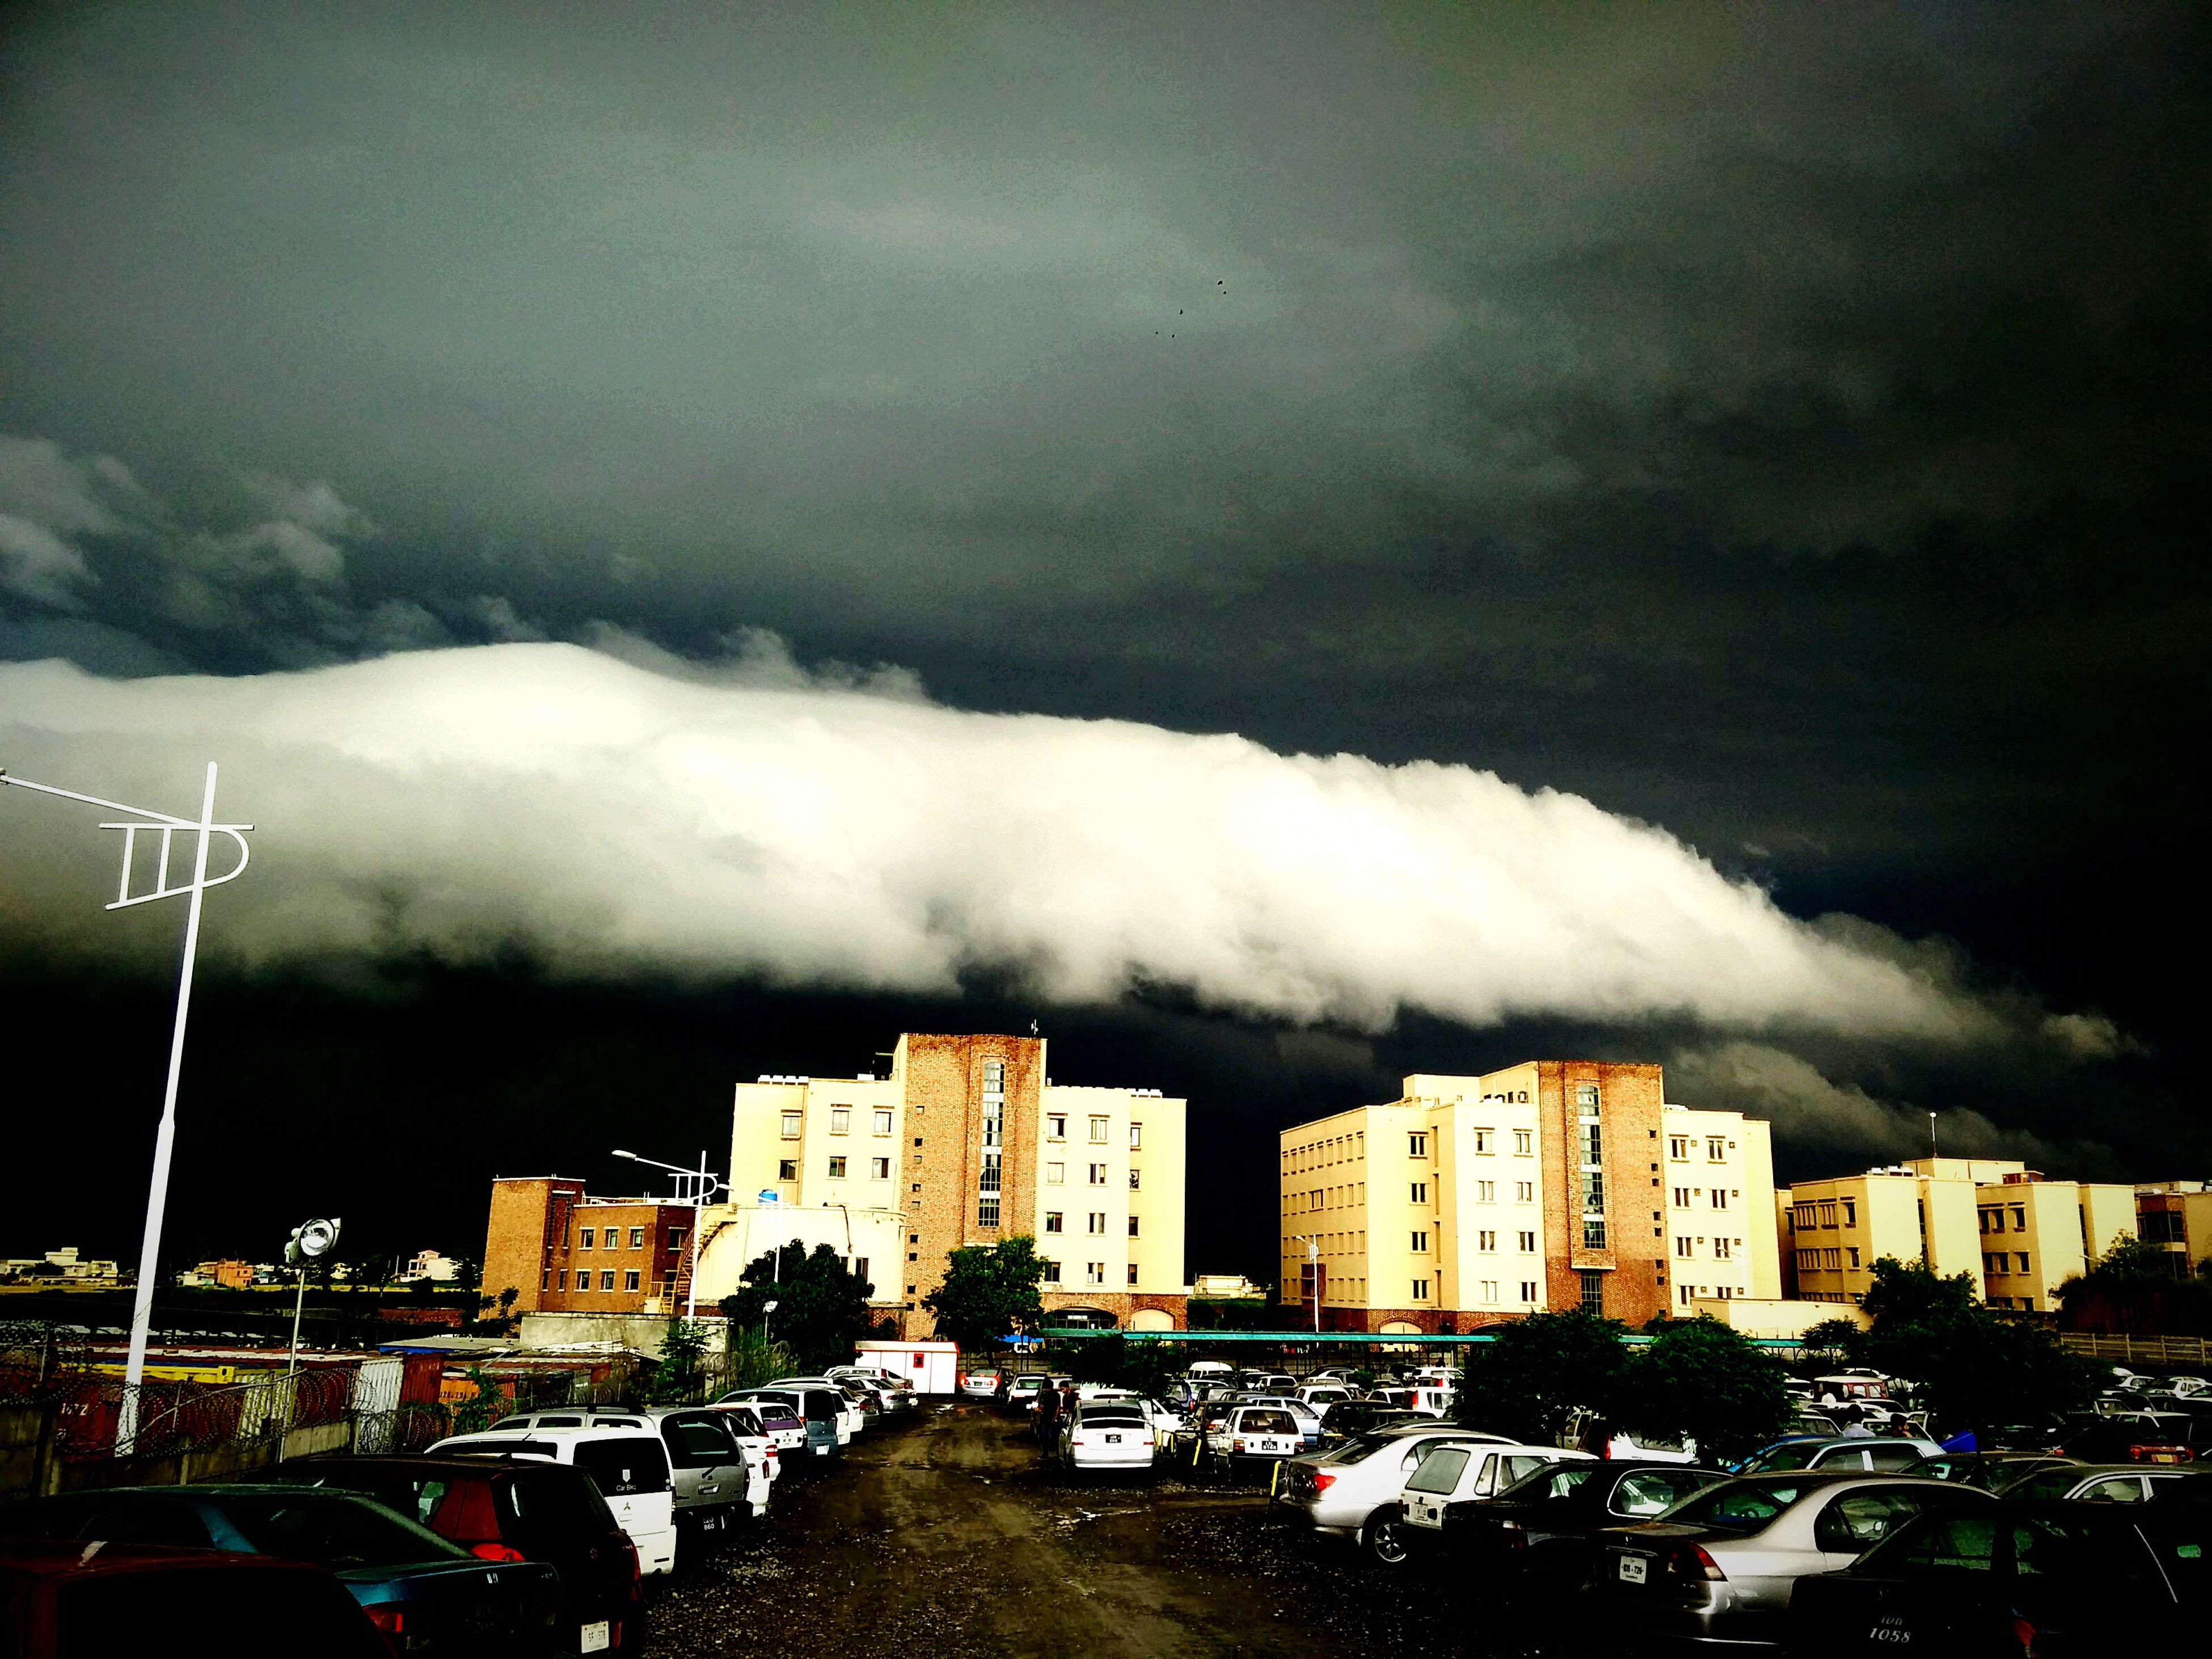 God bless us Hailonmonday Clouds And Sky University Campus Landscape Cloudporn Rain